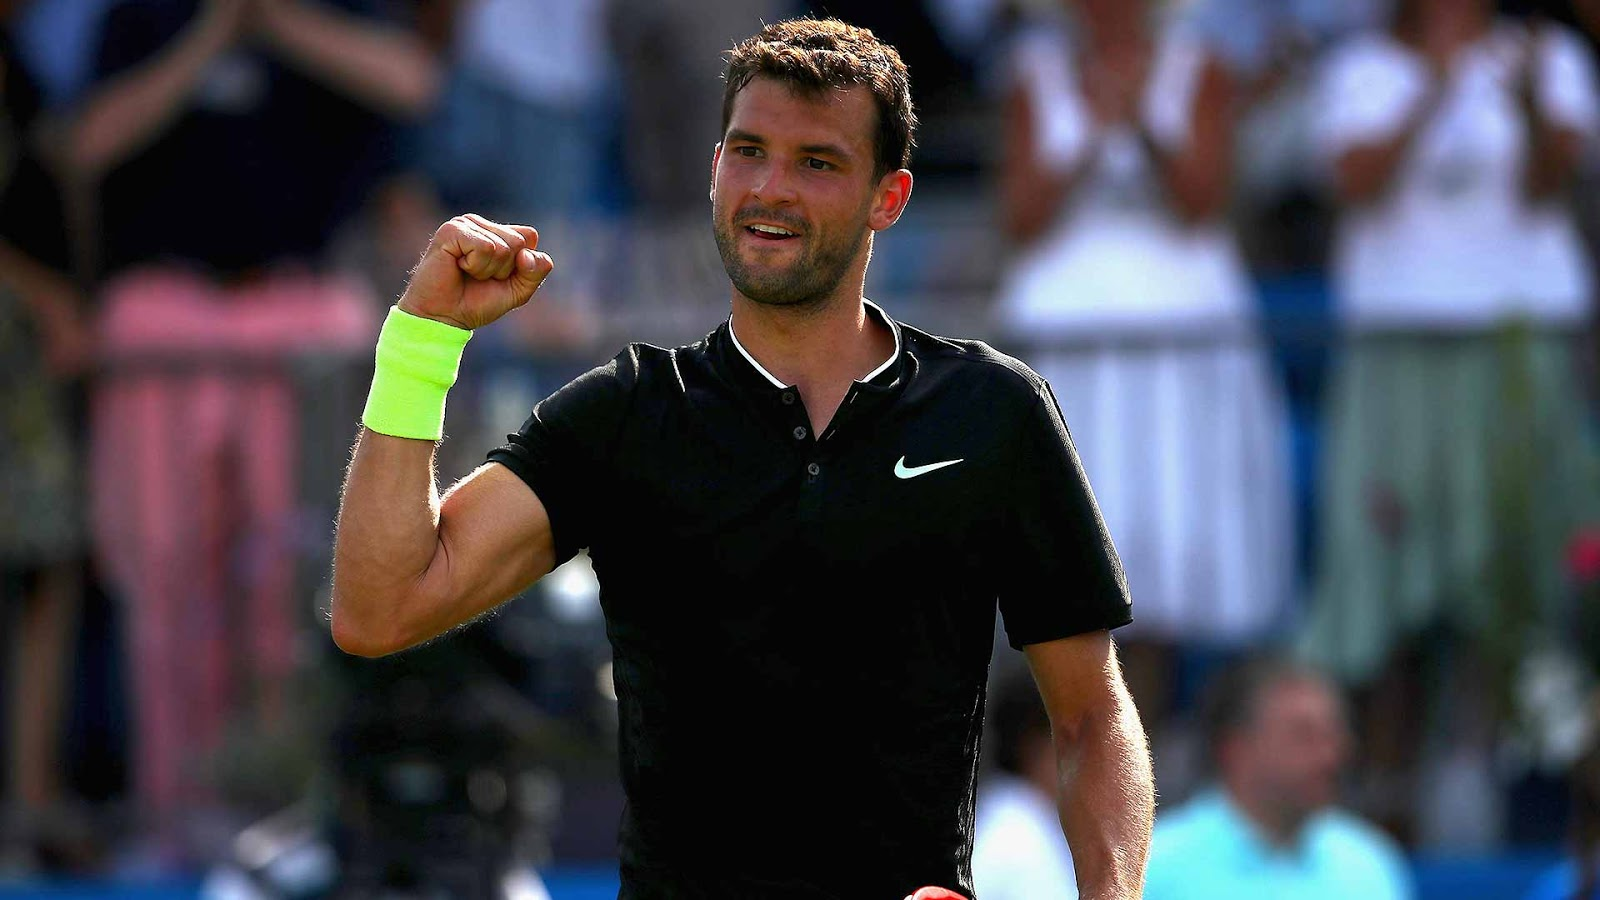 Australian-Open-2018-lieu-Federer-co-gianh-giai-Sharapova-se-thanh-cong-nhu-Serena-3